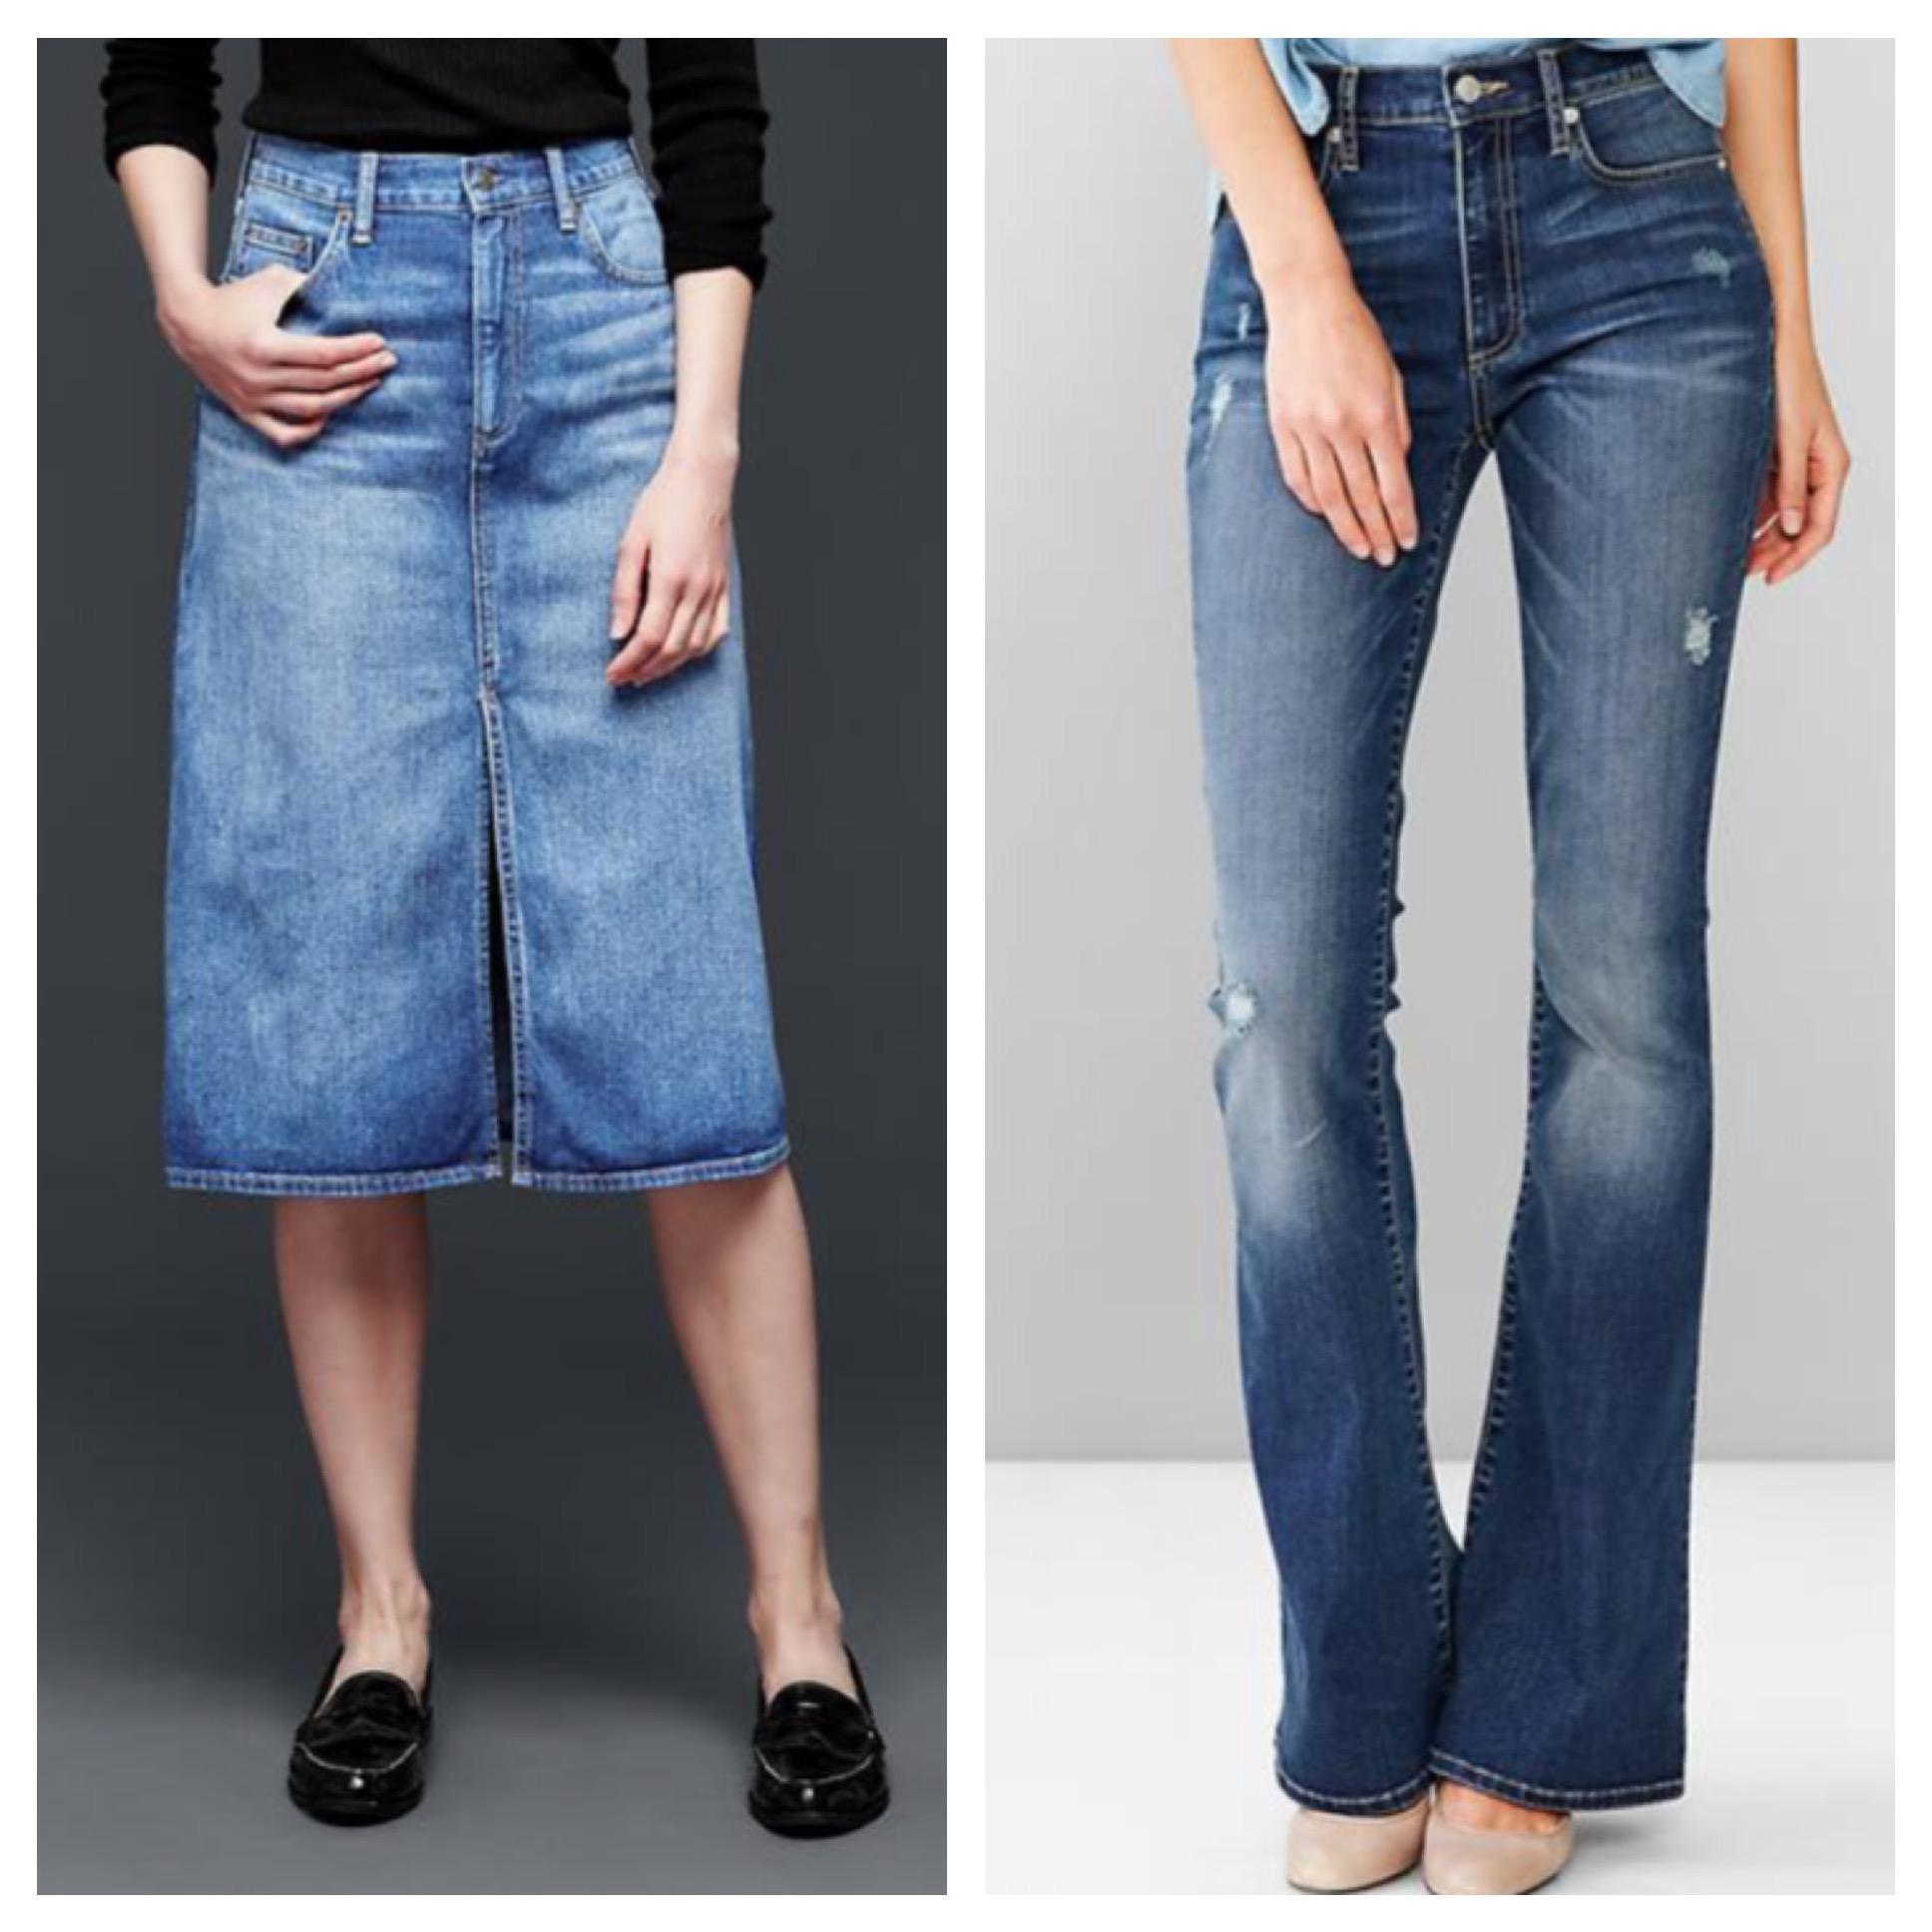 Gap Jean Skirt - Skirts